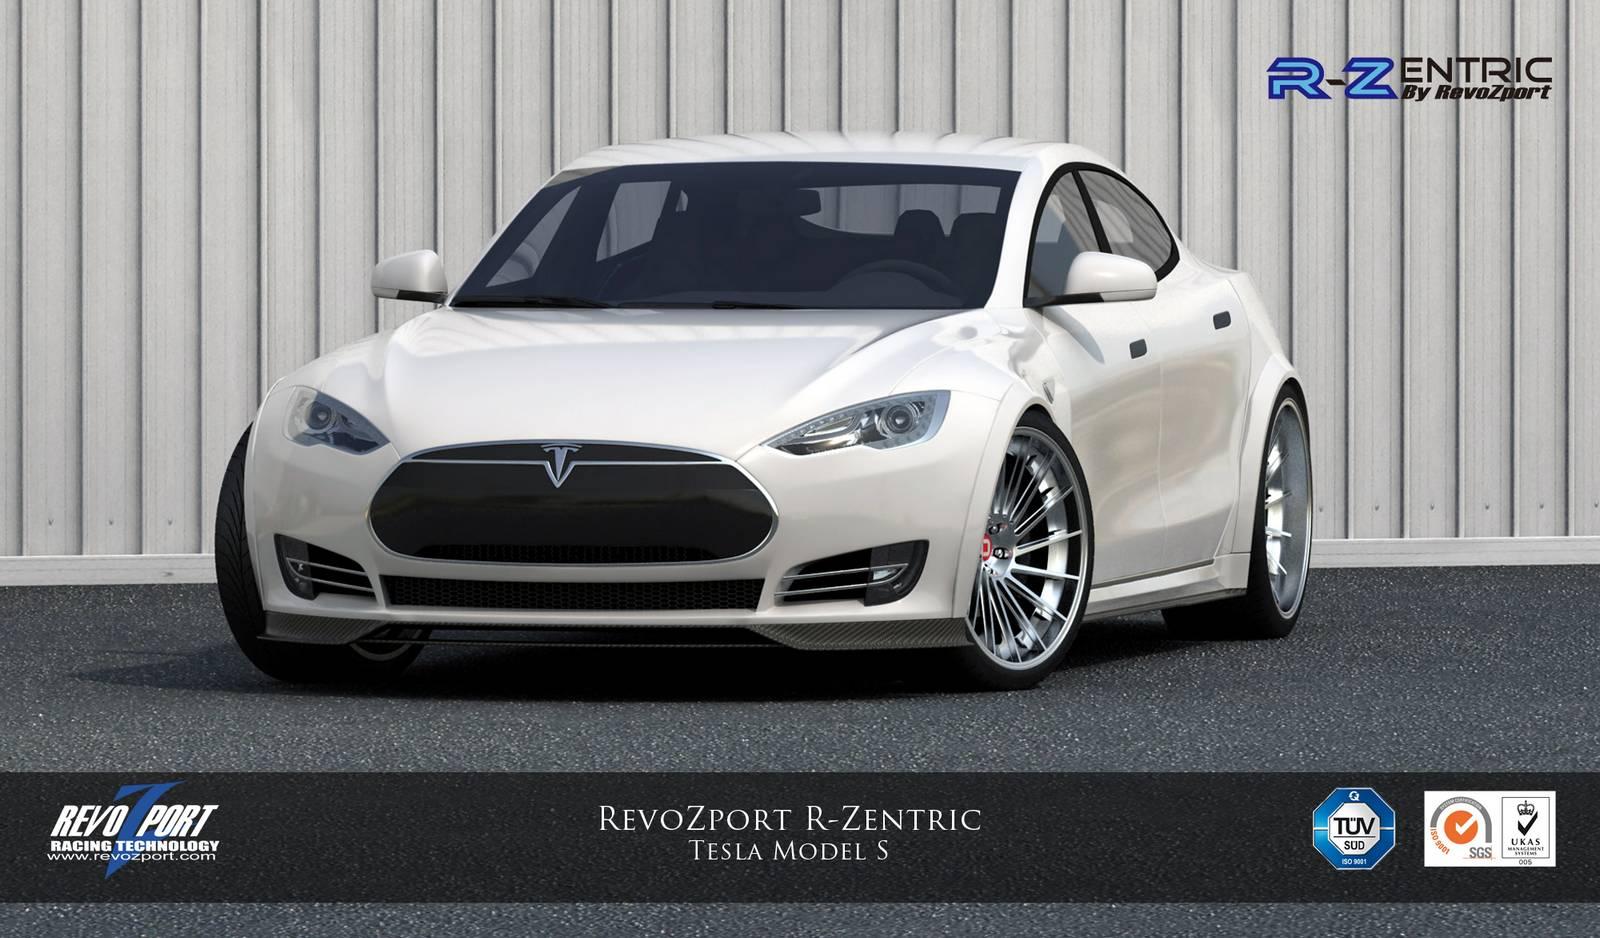 http://www.gtspirit.com/wp-content/uploads/2014/11/Revozport-Tesla-Model-S-2.jpg